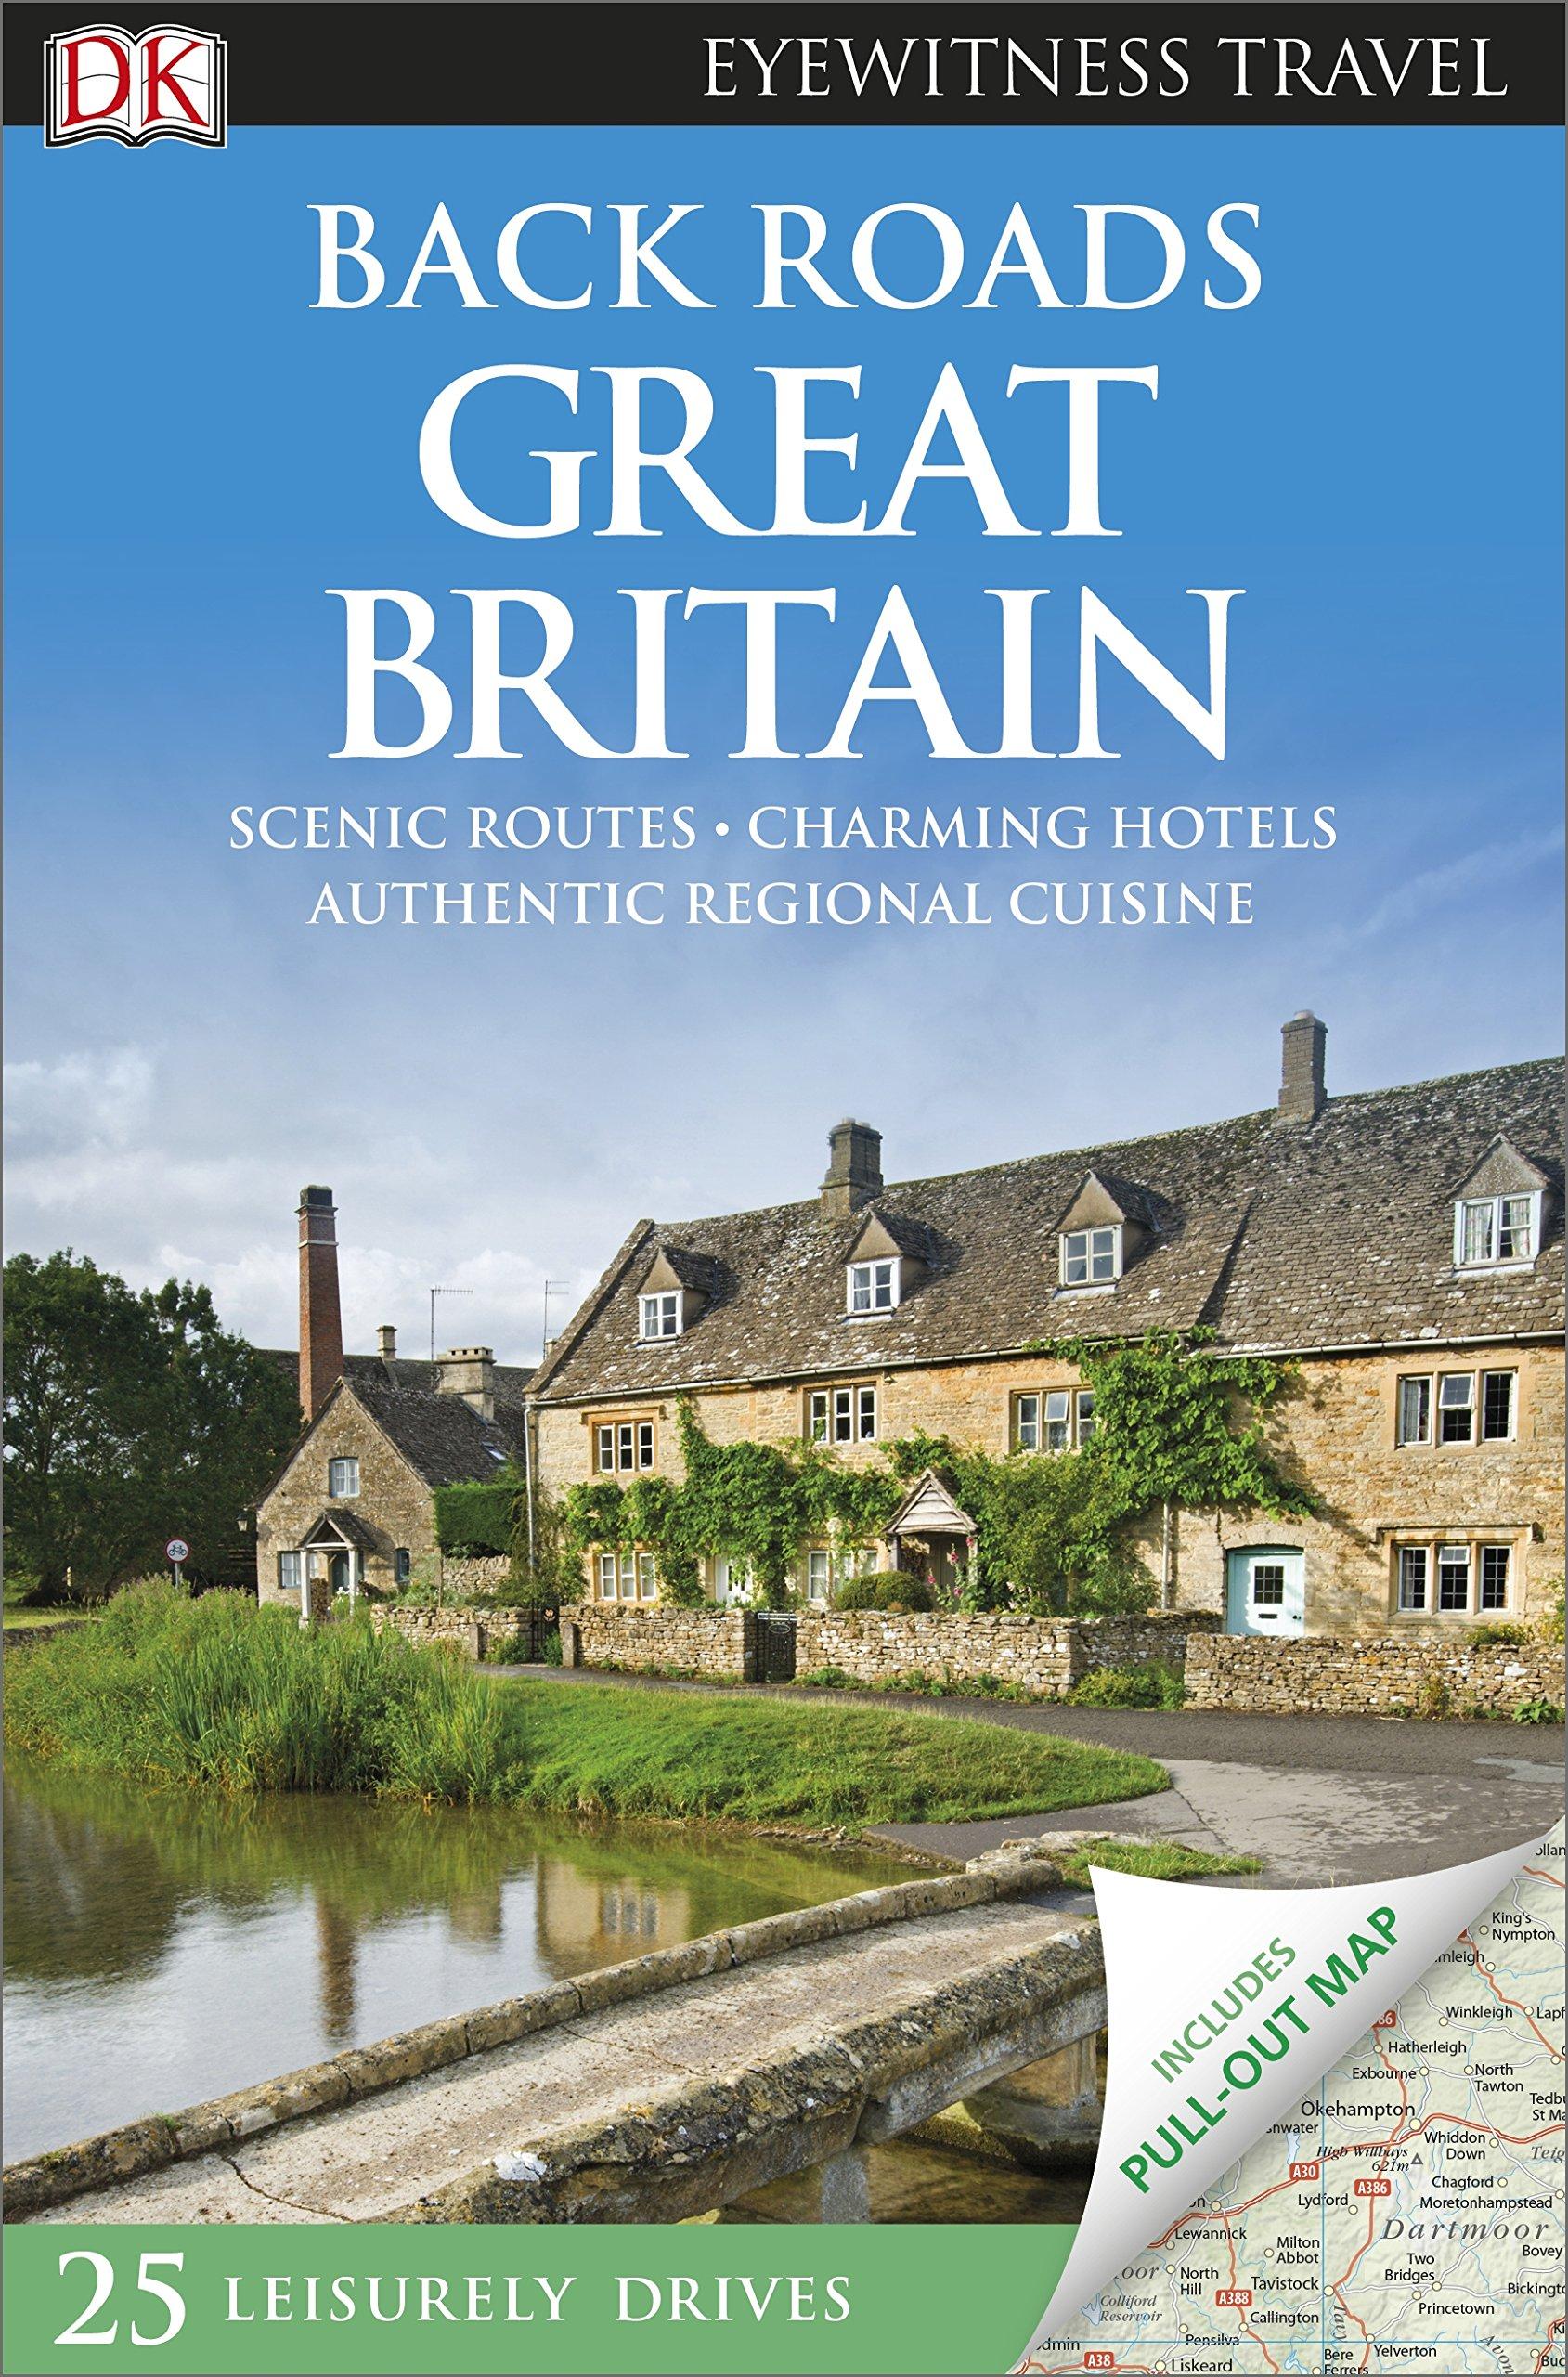 Back Roads Great Britain (DK Eyewitness Travel Guide)